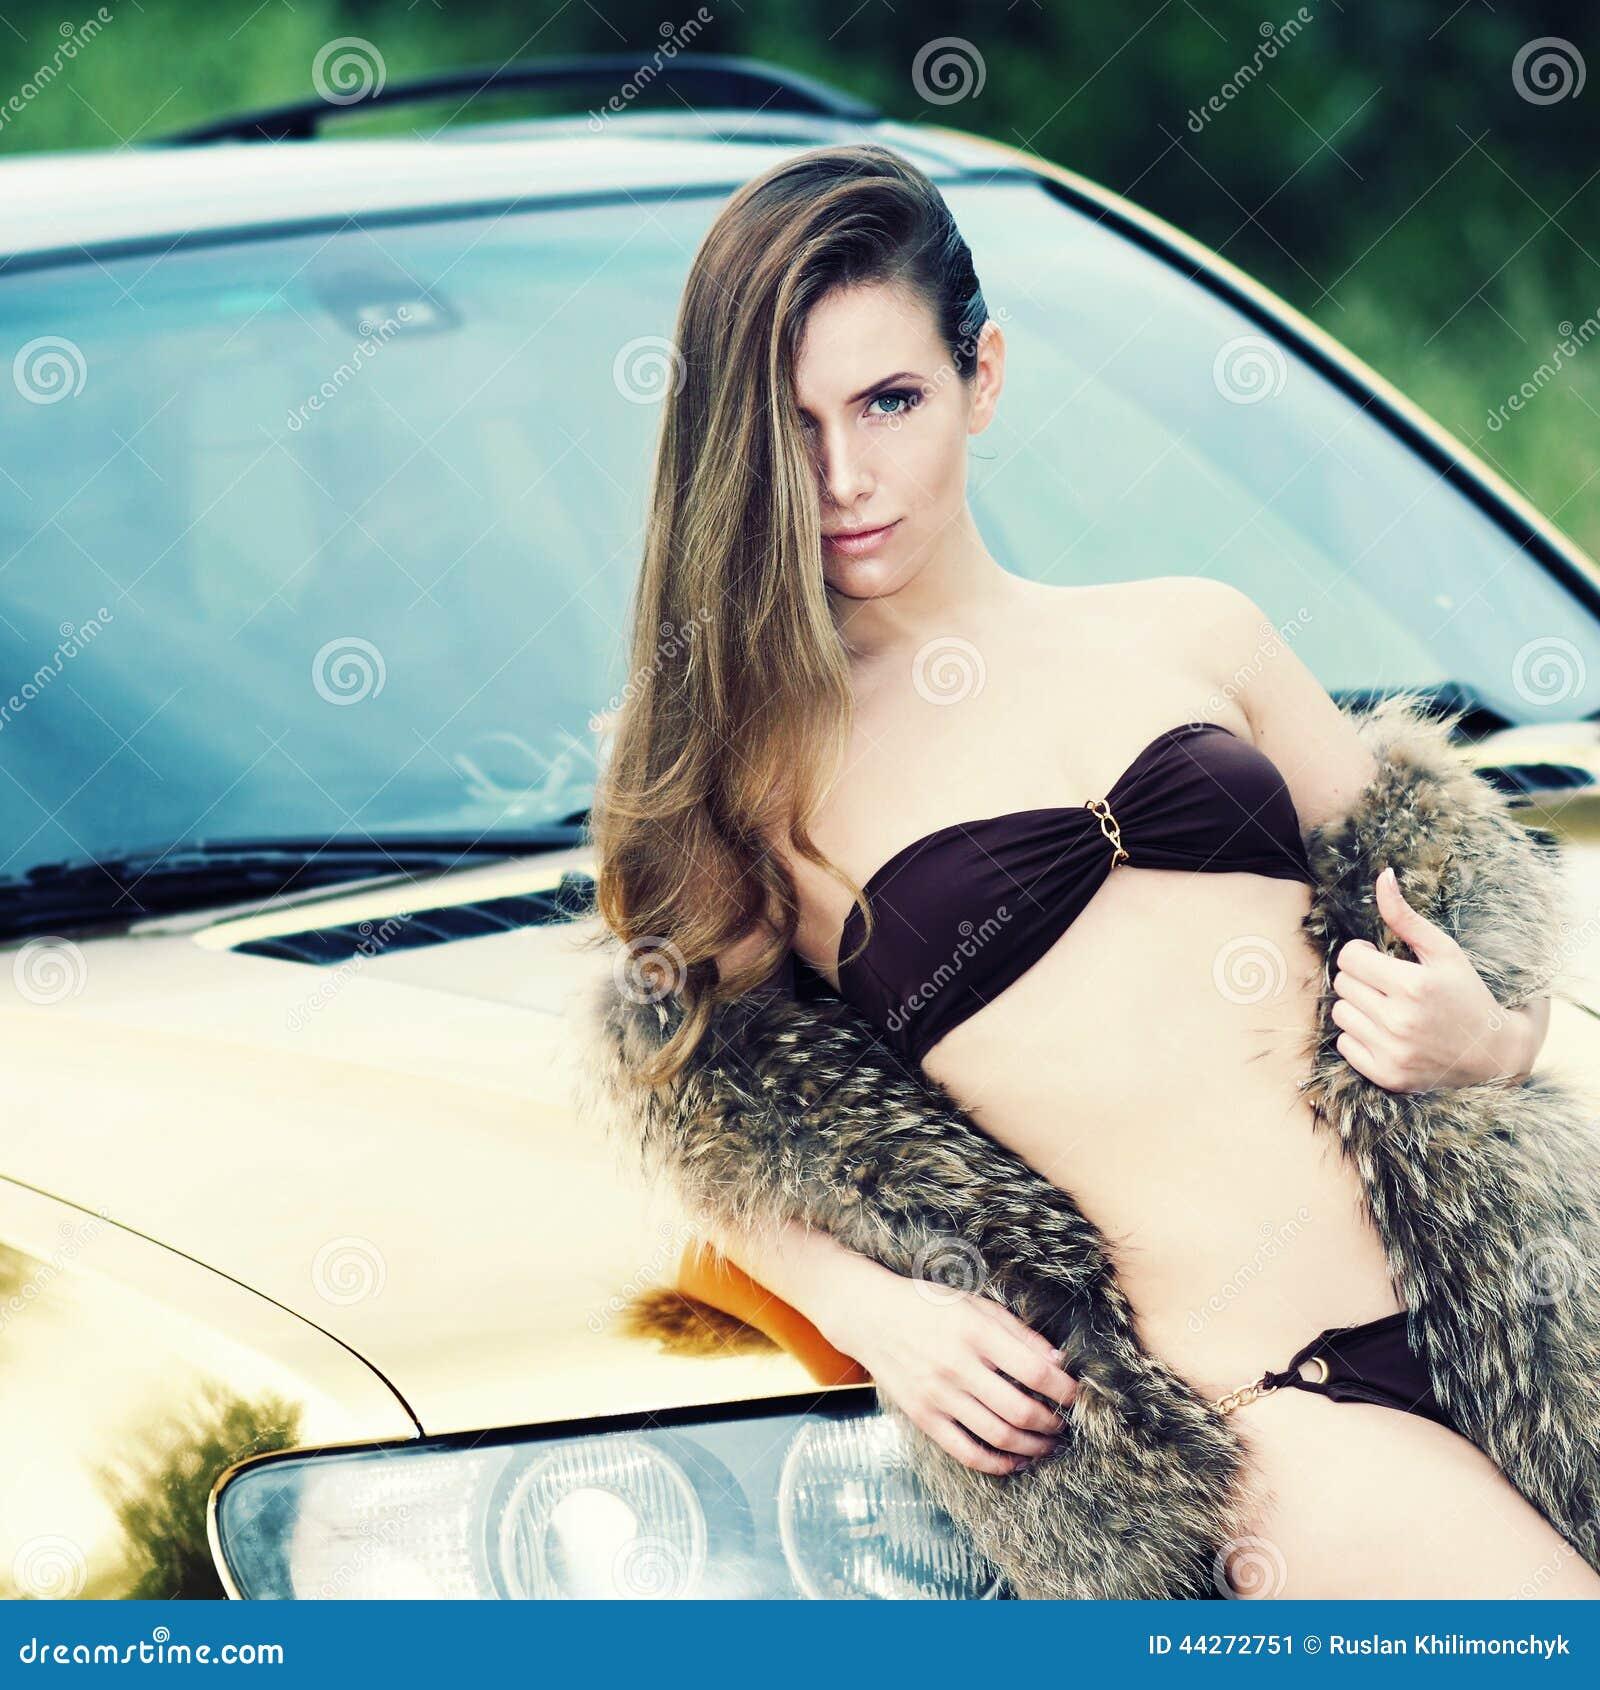 Woman With Beautiful Body In Bikini At Beach Stock Image: Lady Near The Golden Car Stock Image. Image Of Body